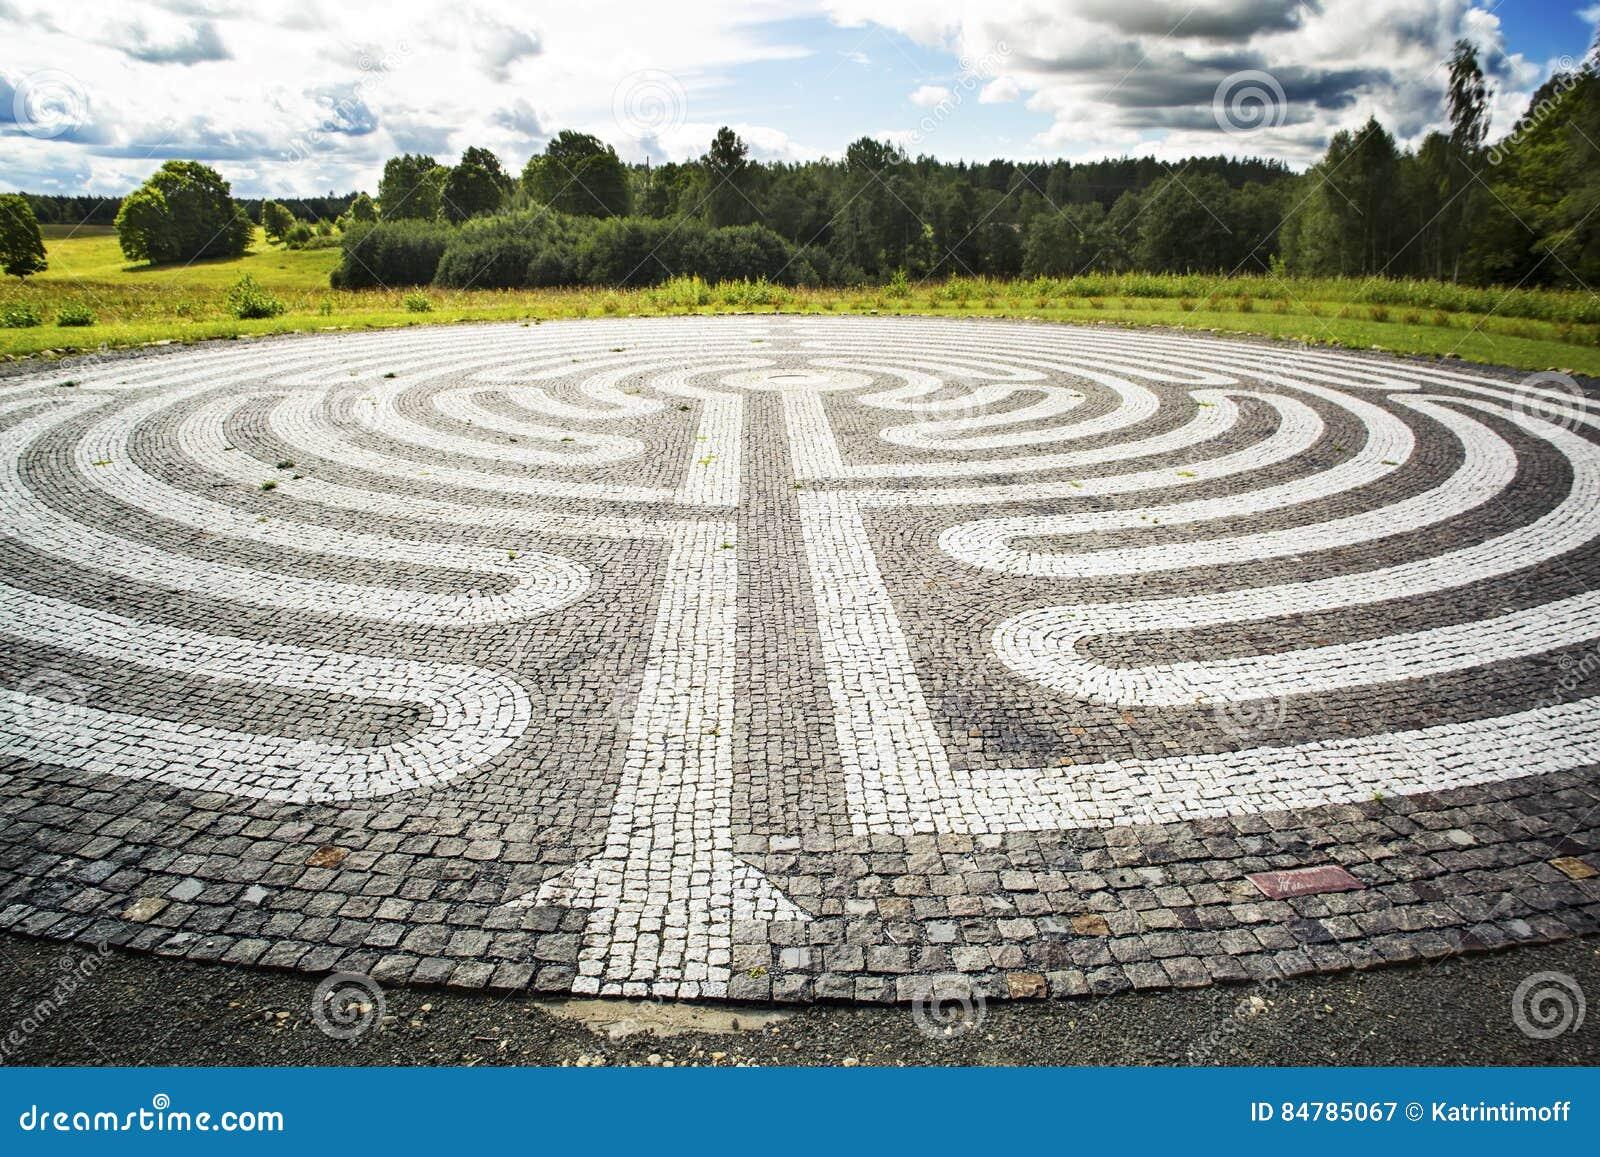 Gotisch labyrint van zwart-witte cobble-stones